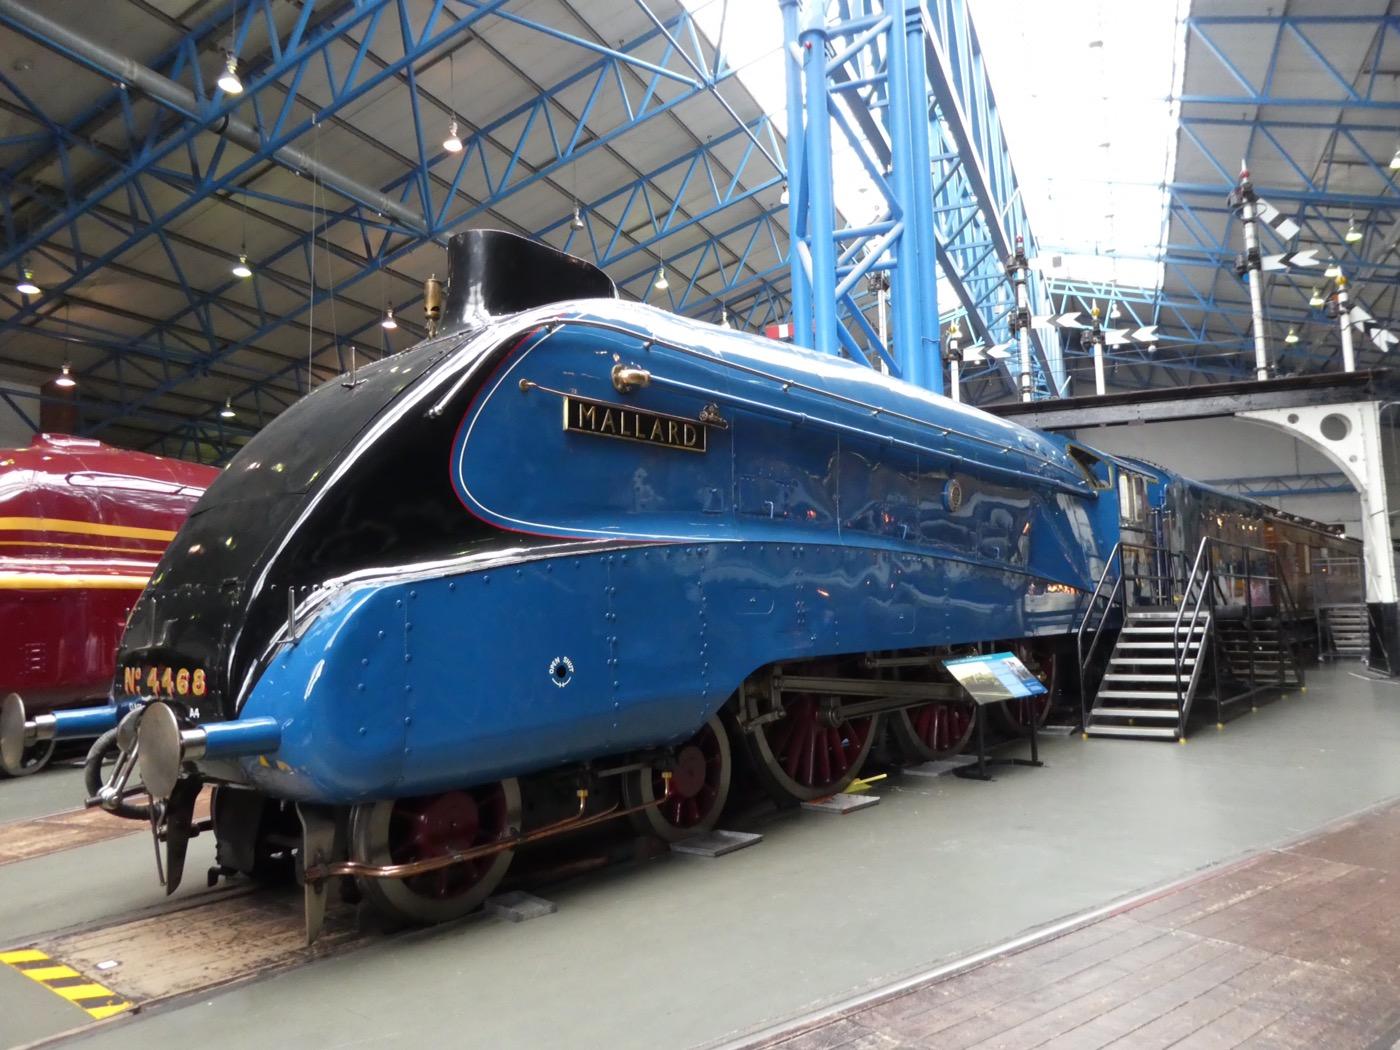 Mallard Steam Locomotive, National Rail Museum York